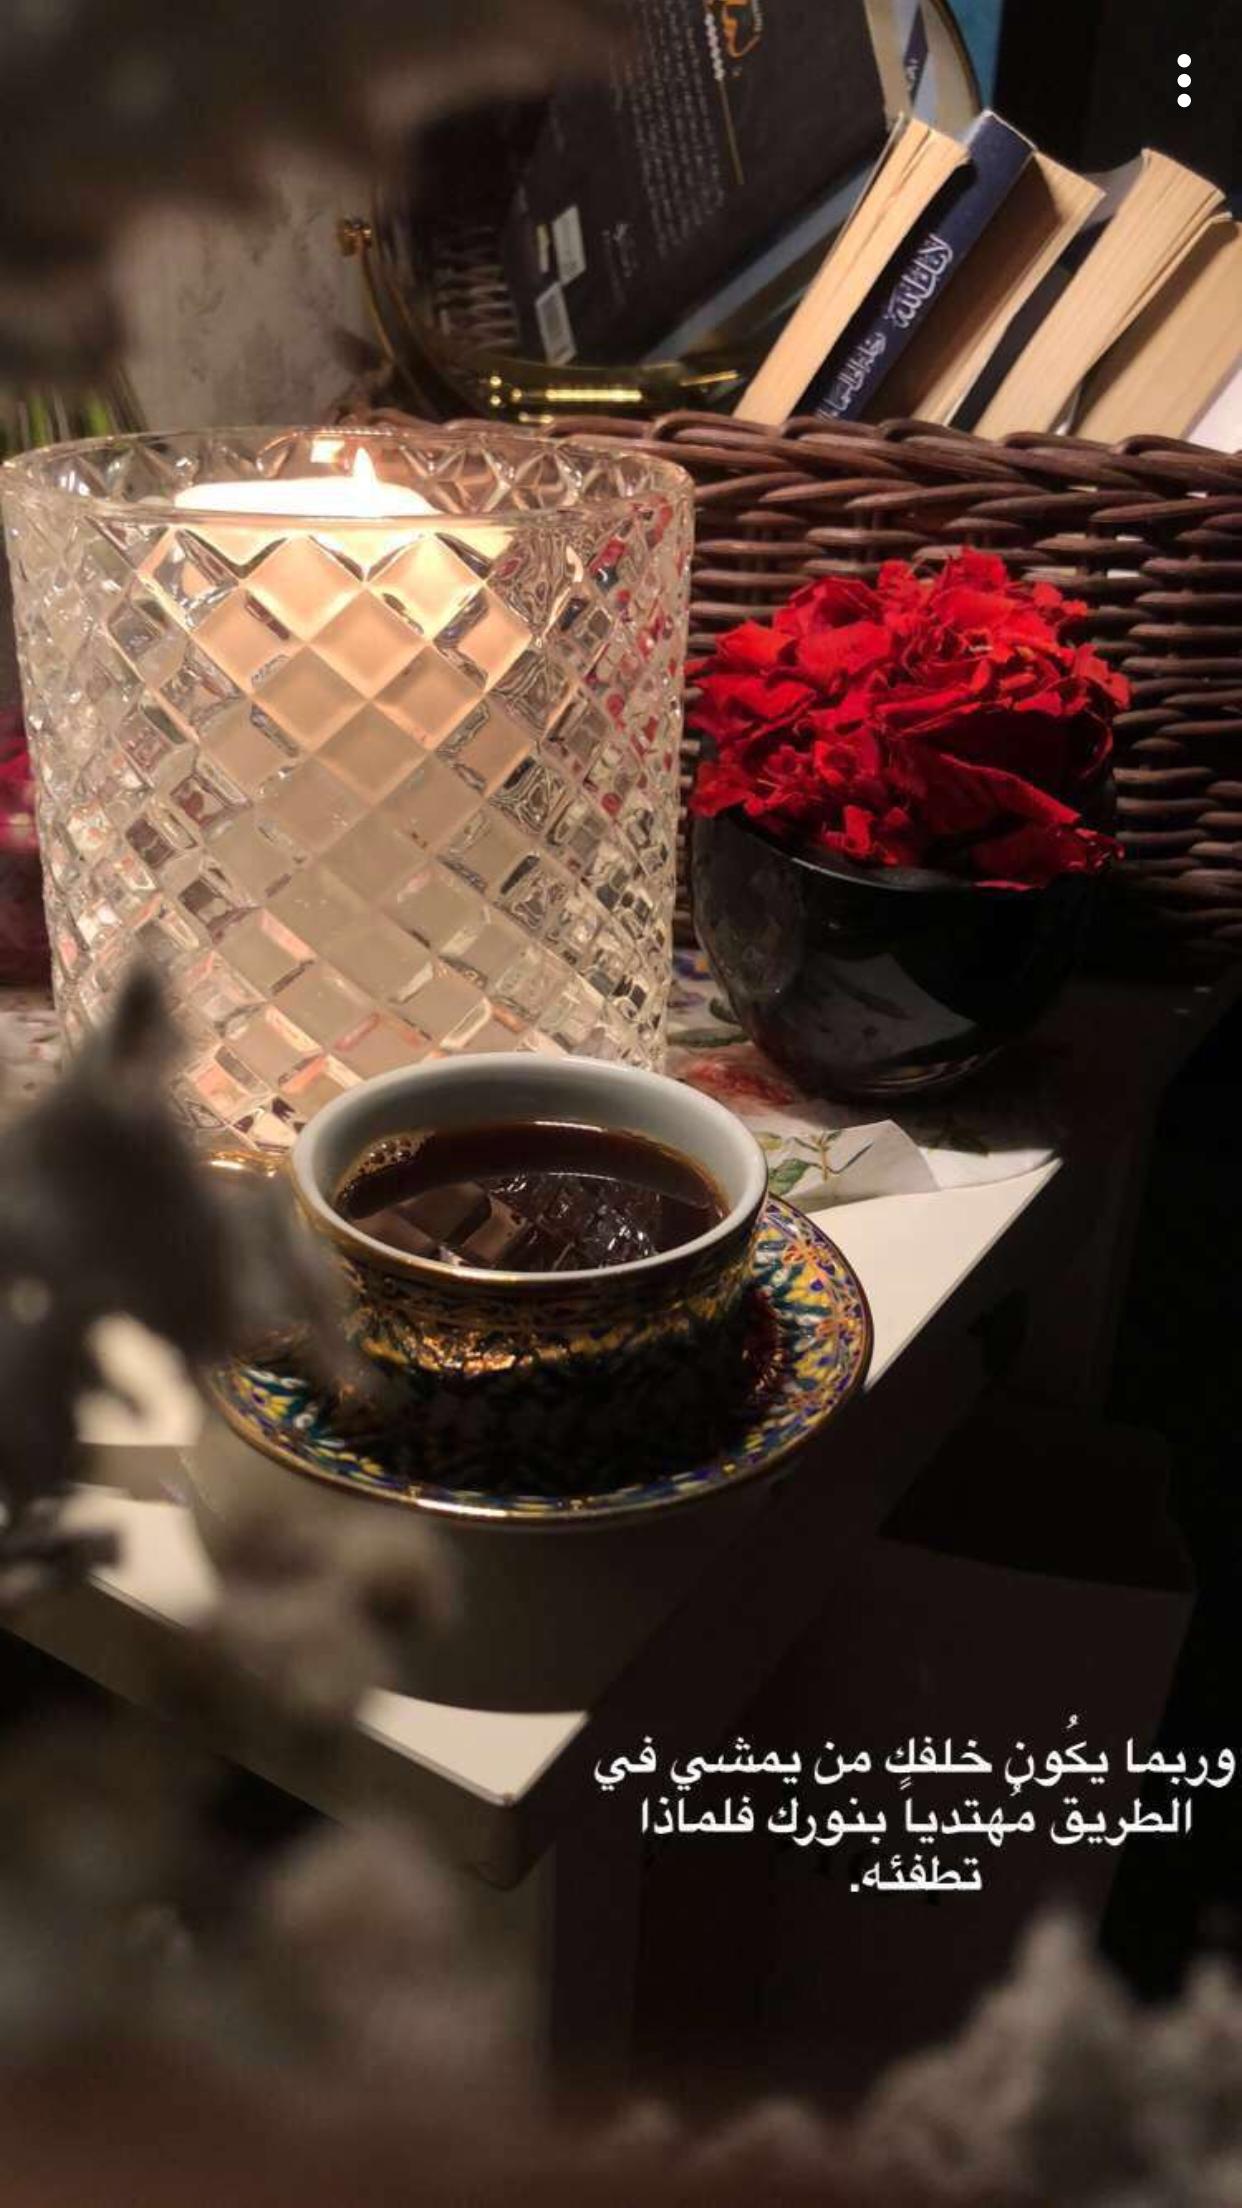 قروب ٢٩ ابريل ١٨ Arabic Quotes Cover Photo Quotes Bff Gifts